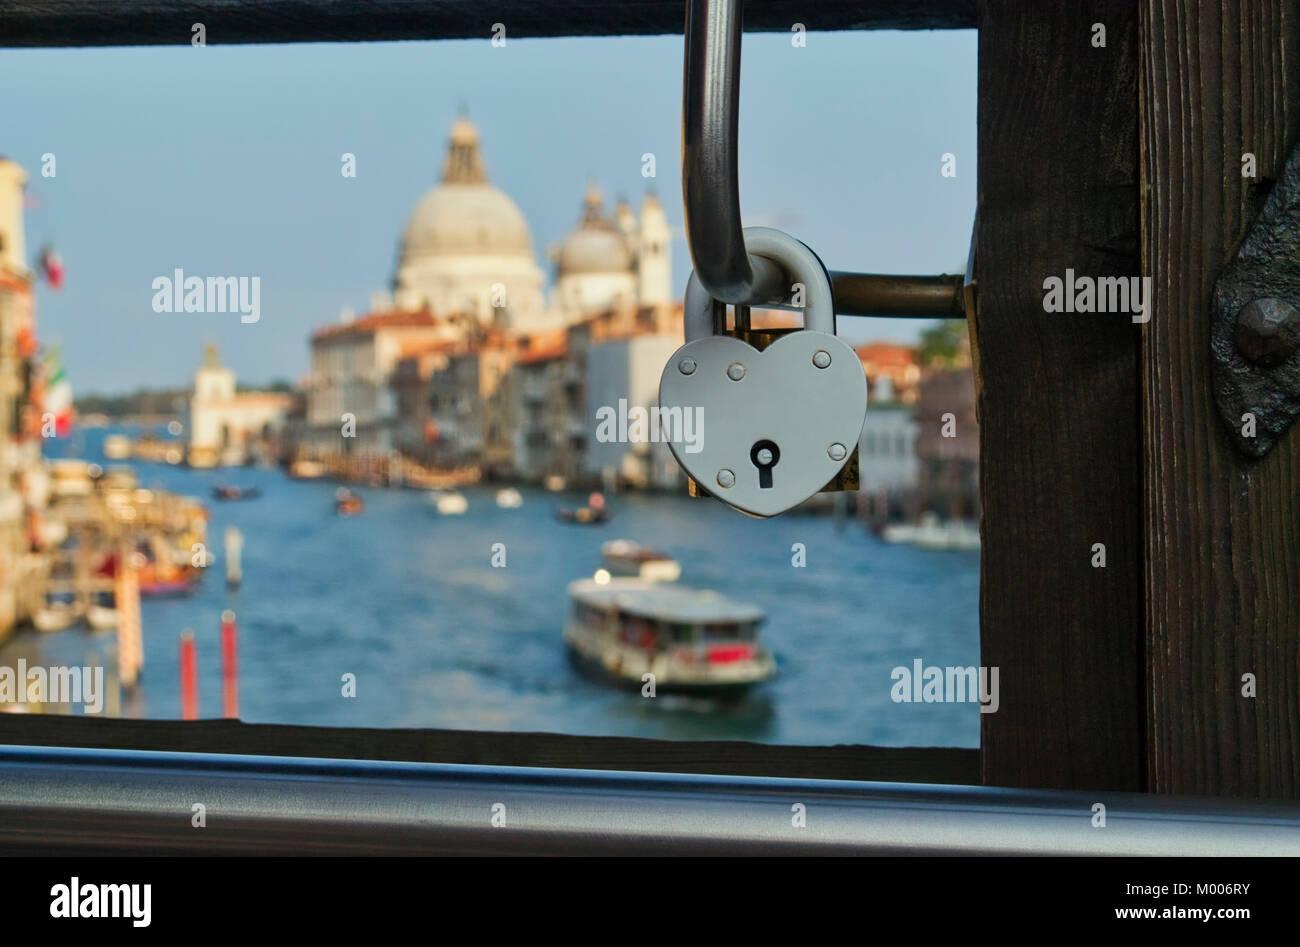 Heart shaped love lock on a bridge in Venice Italy - Stock Image